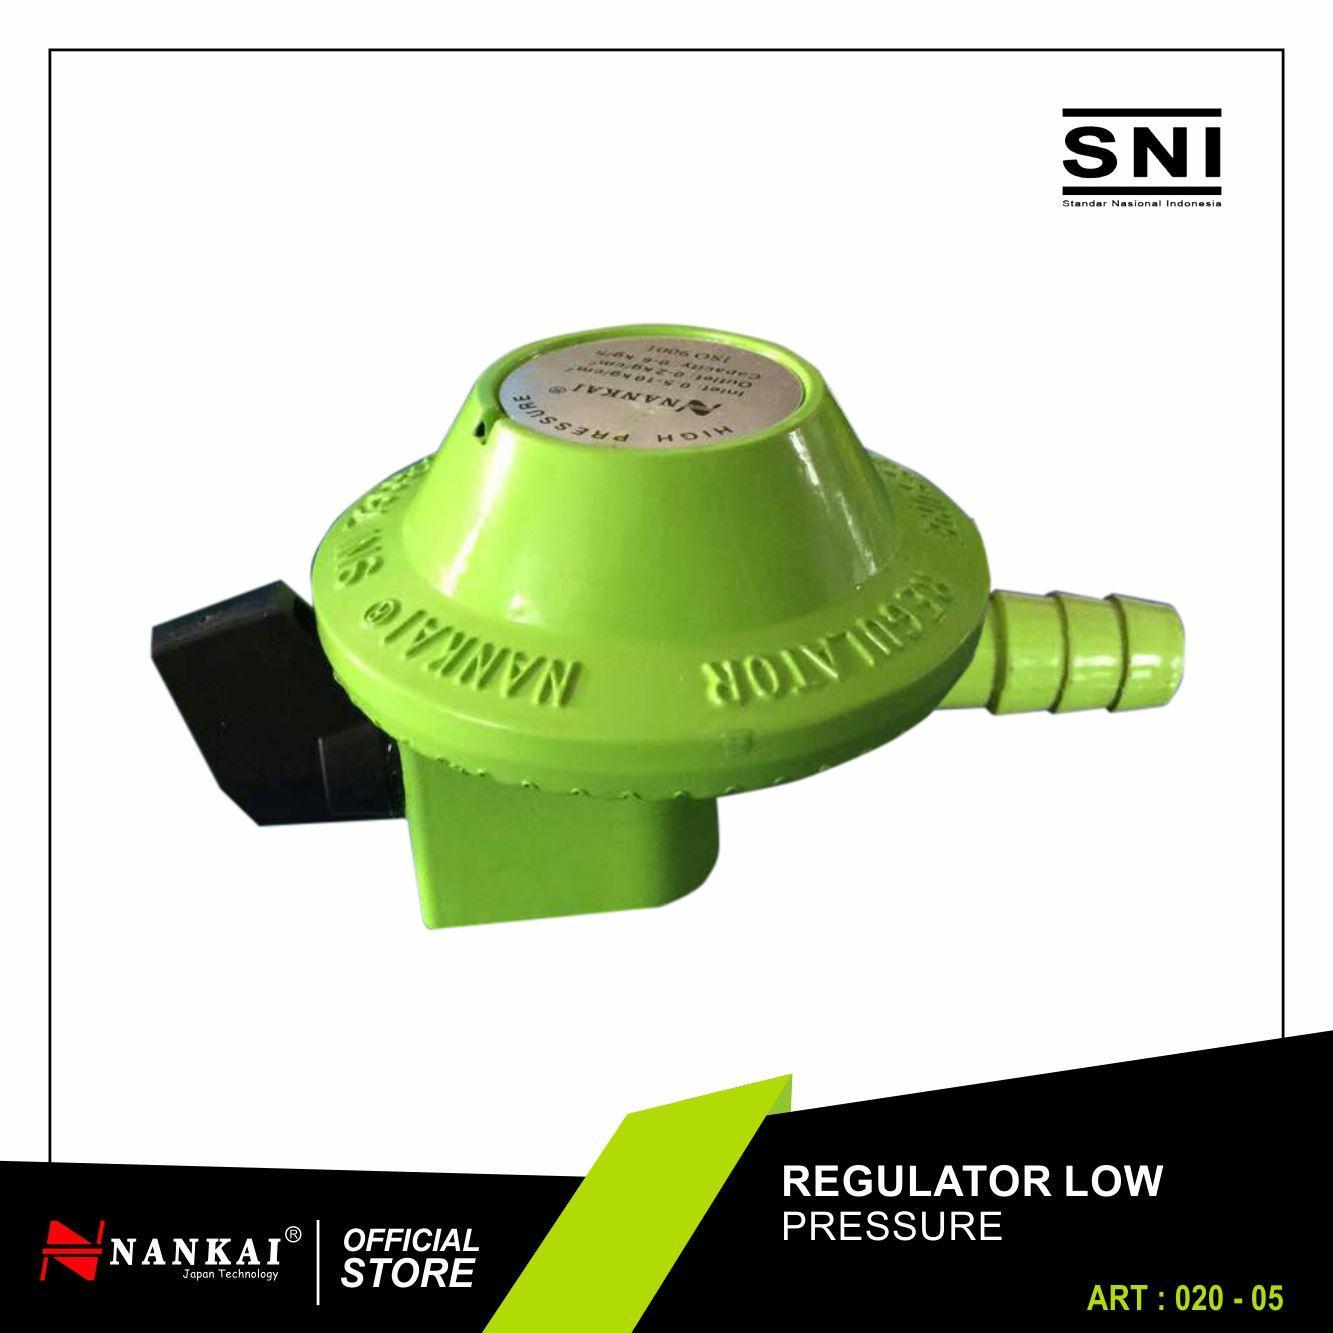 Nankai Regulator Low Pressure By Nankaitools.